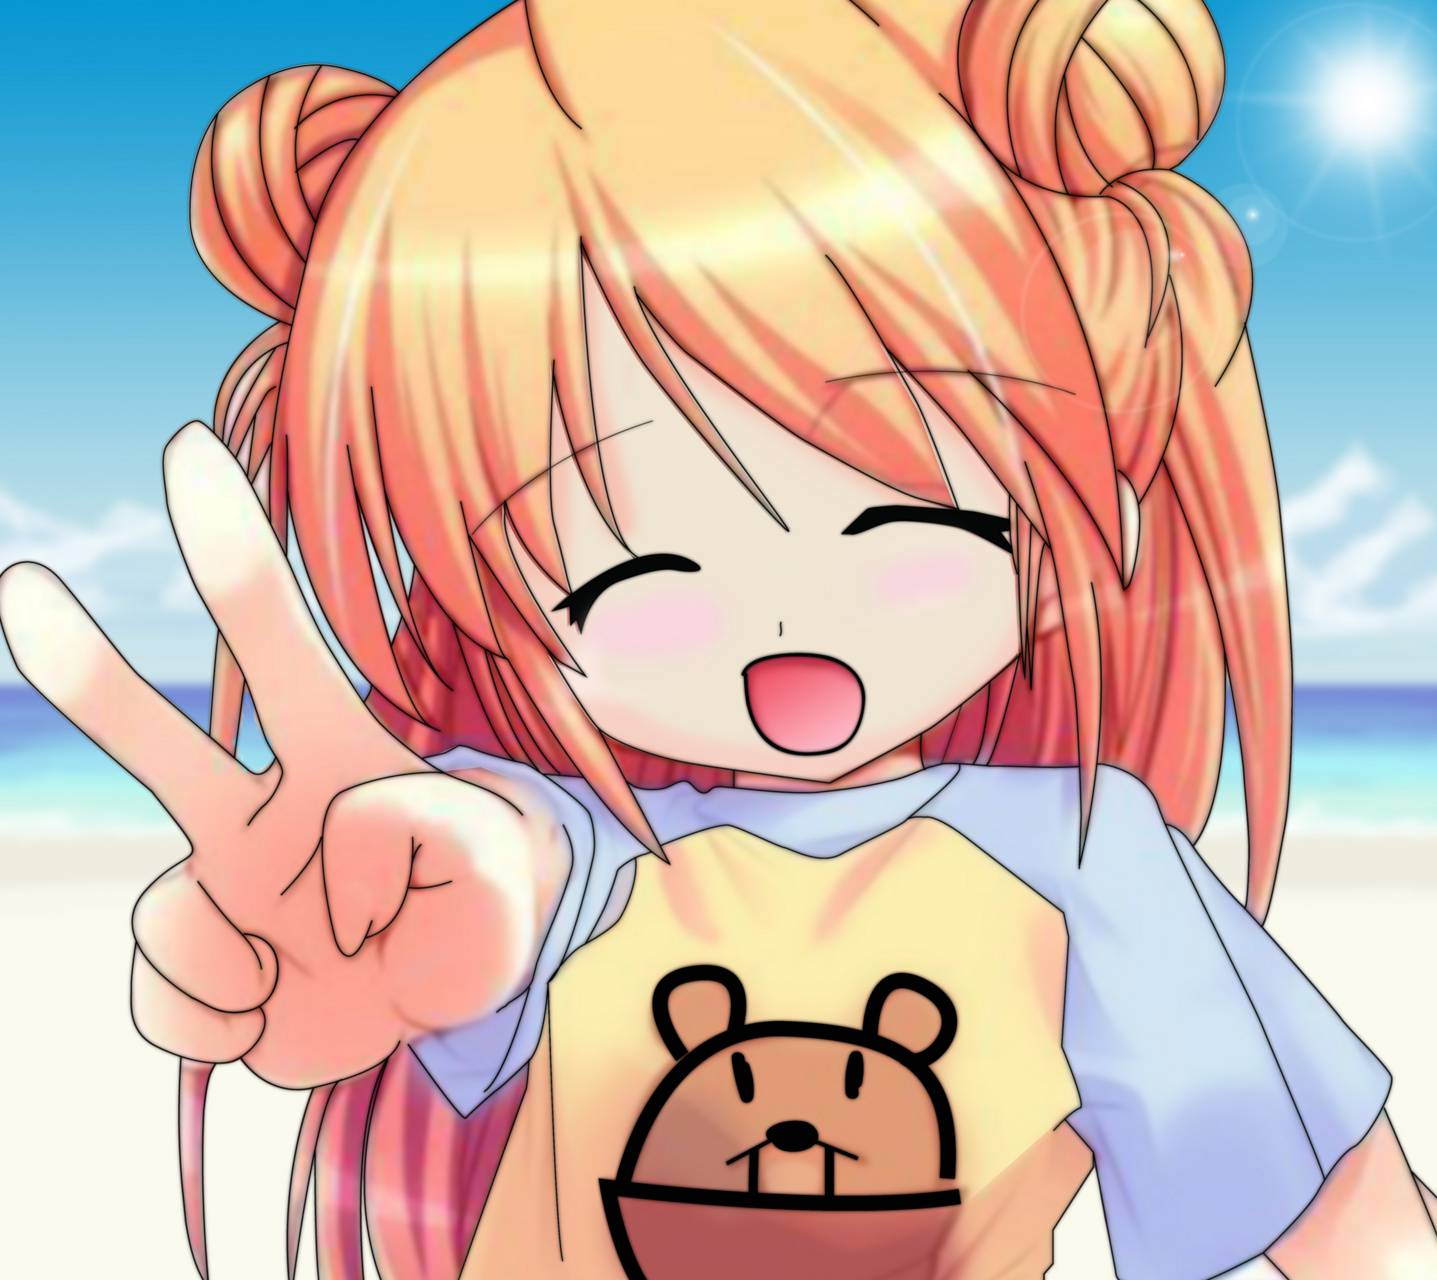 Cute Anime Girl Wallpaper By Thegrandstaf94 Af Free On Zedge